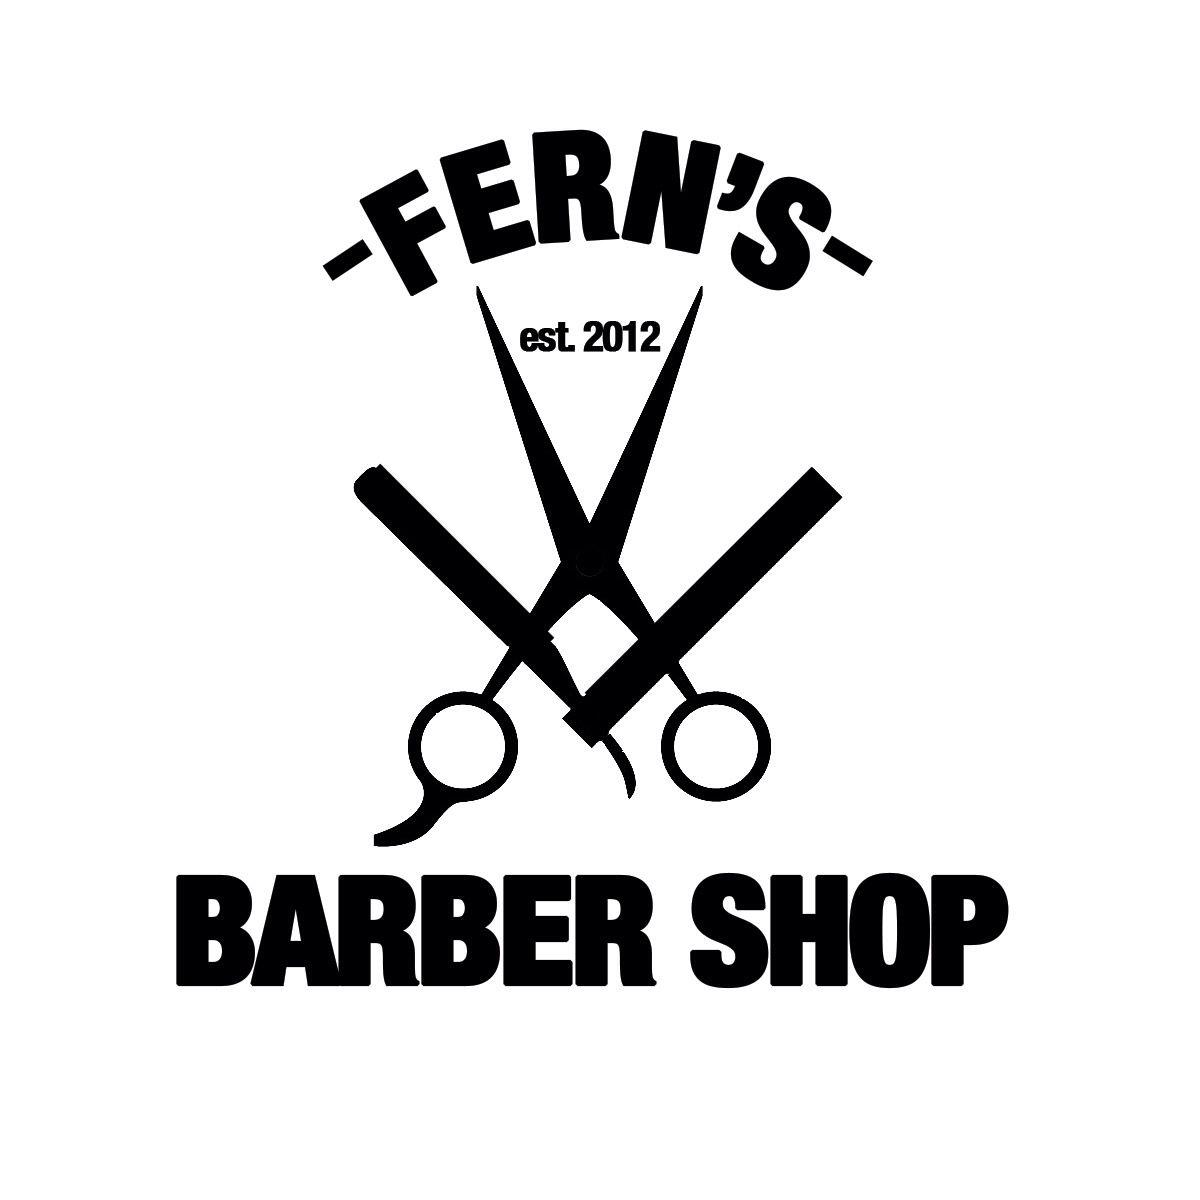 Barbershop Logo | Barber | Pinterest | Barbershop